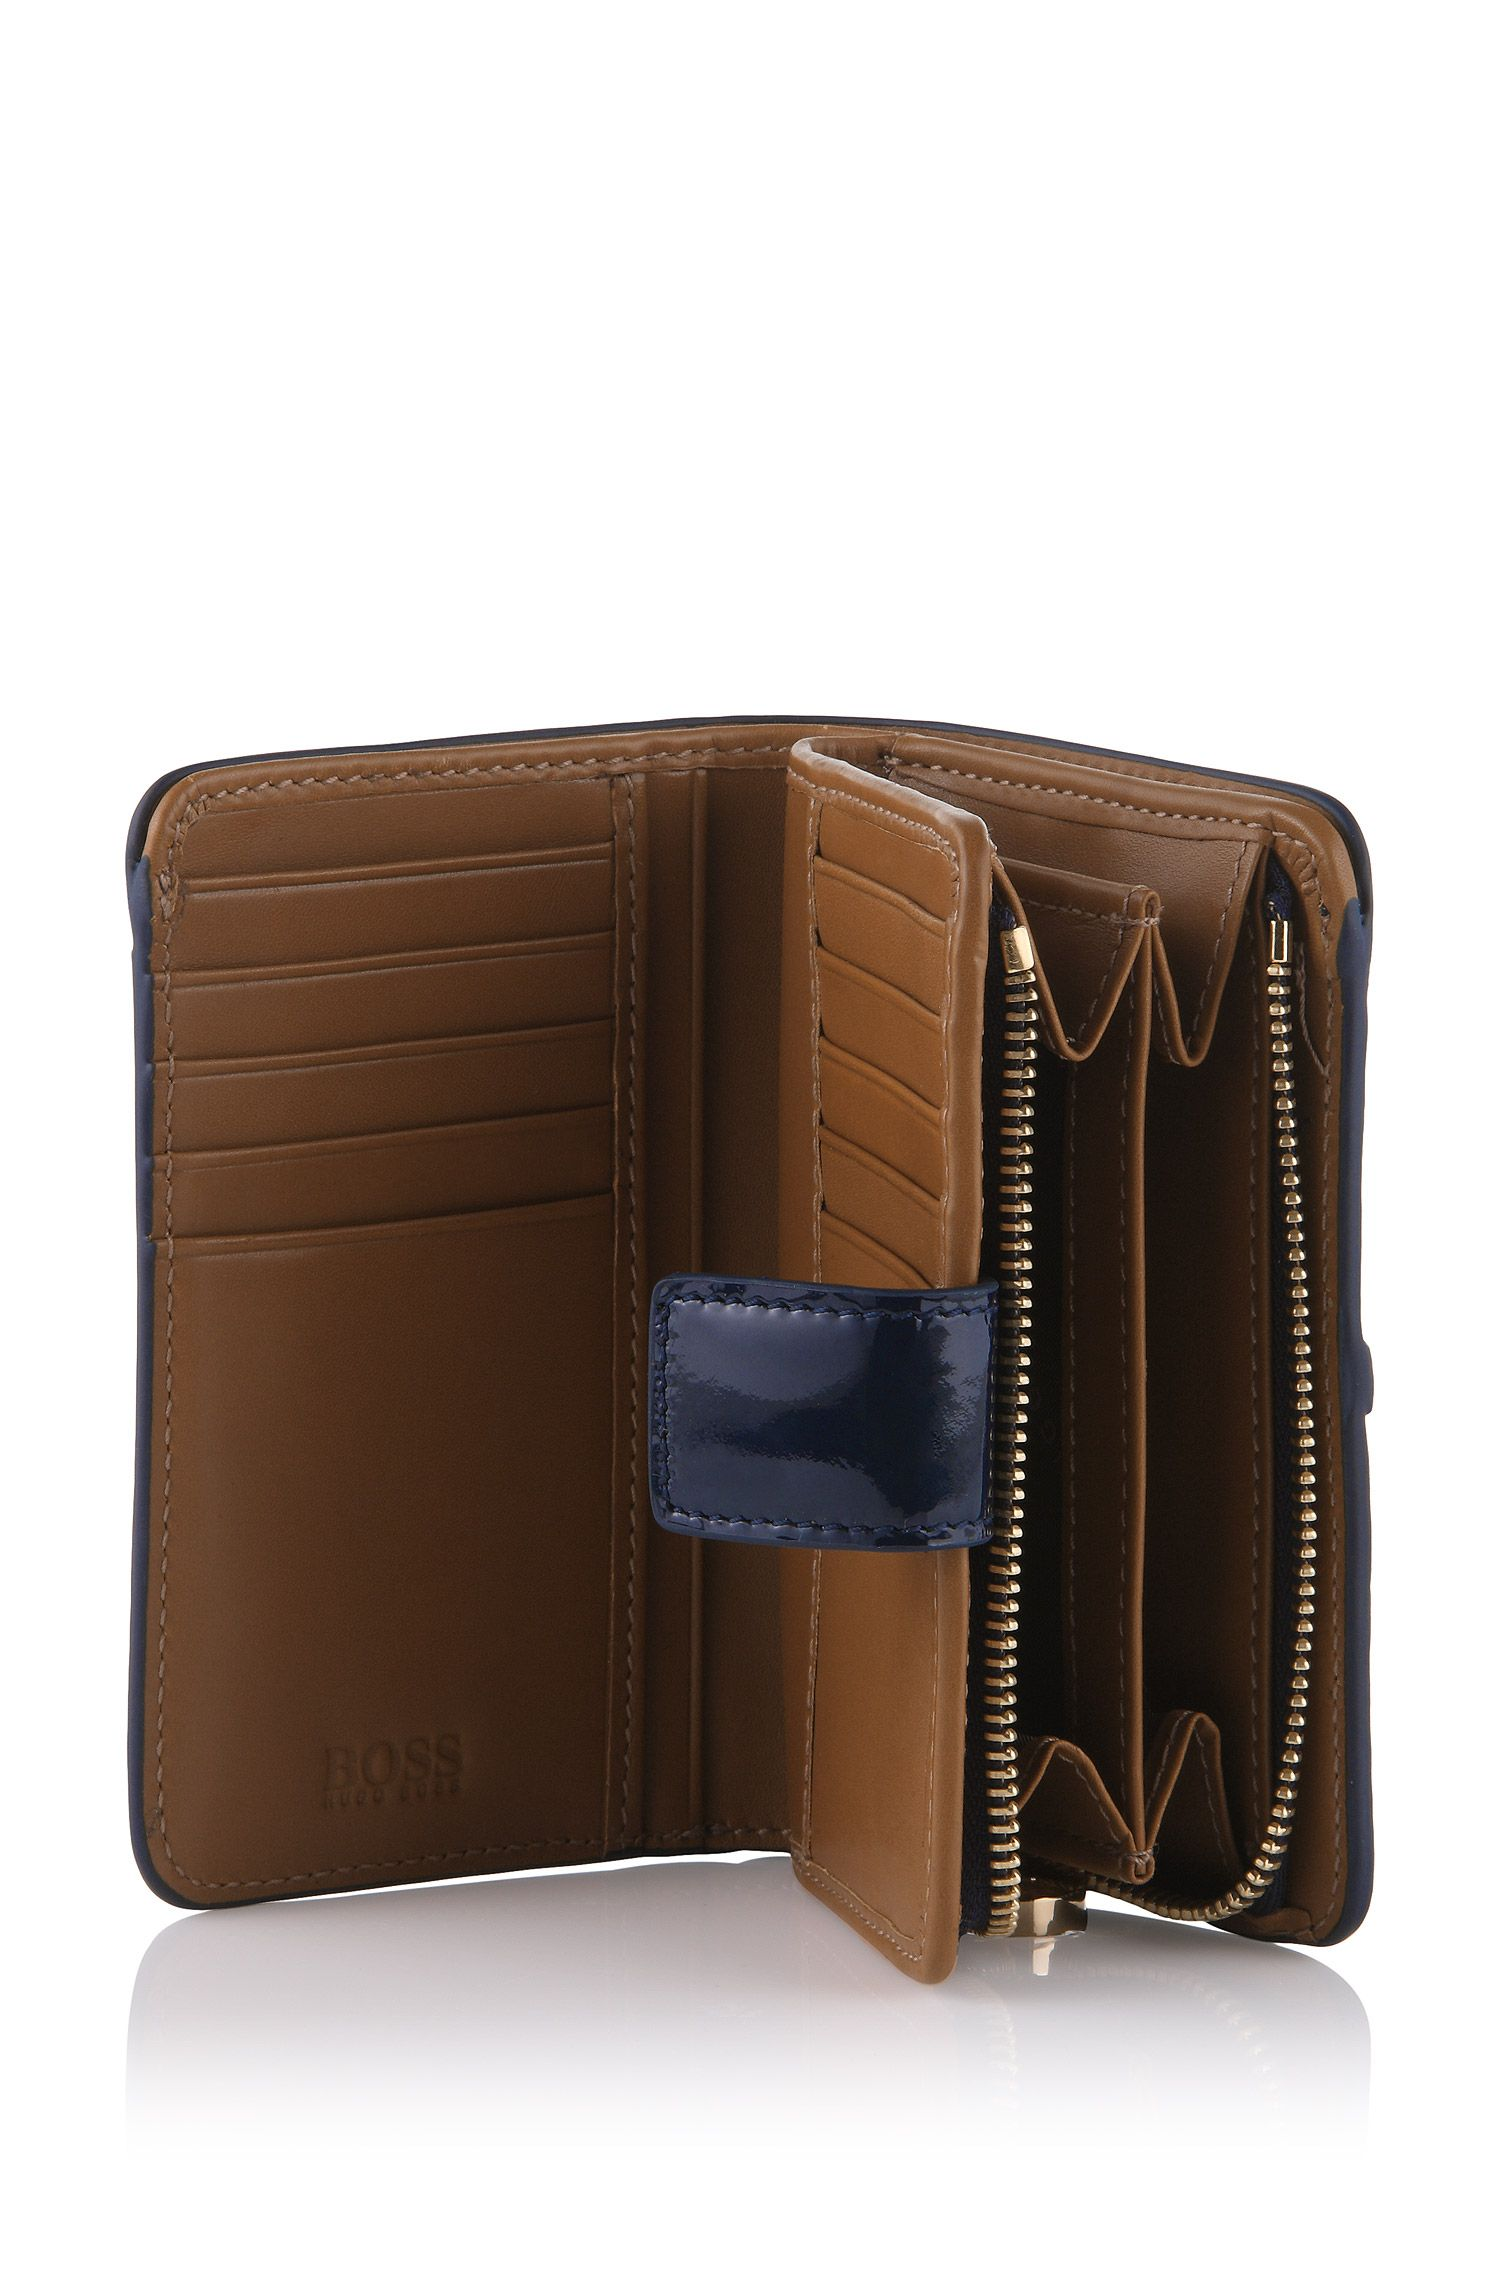 Portemonnaie ´Catrina-V` aus Kalbsleder